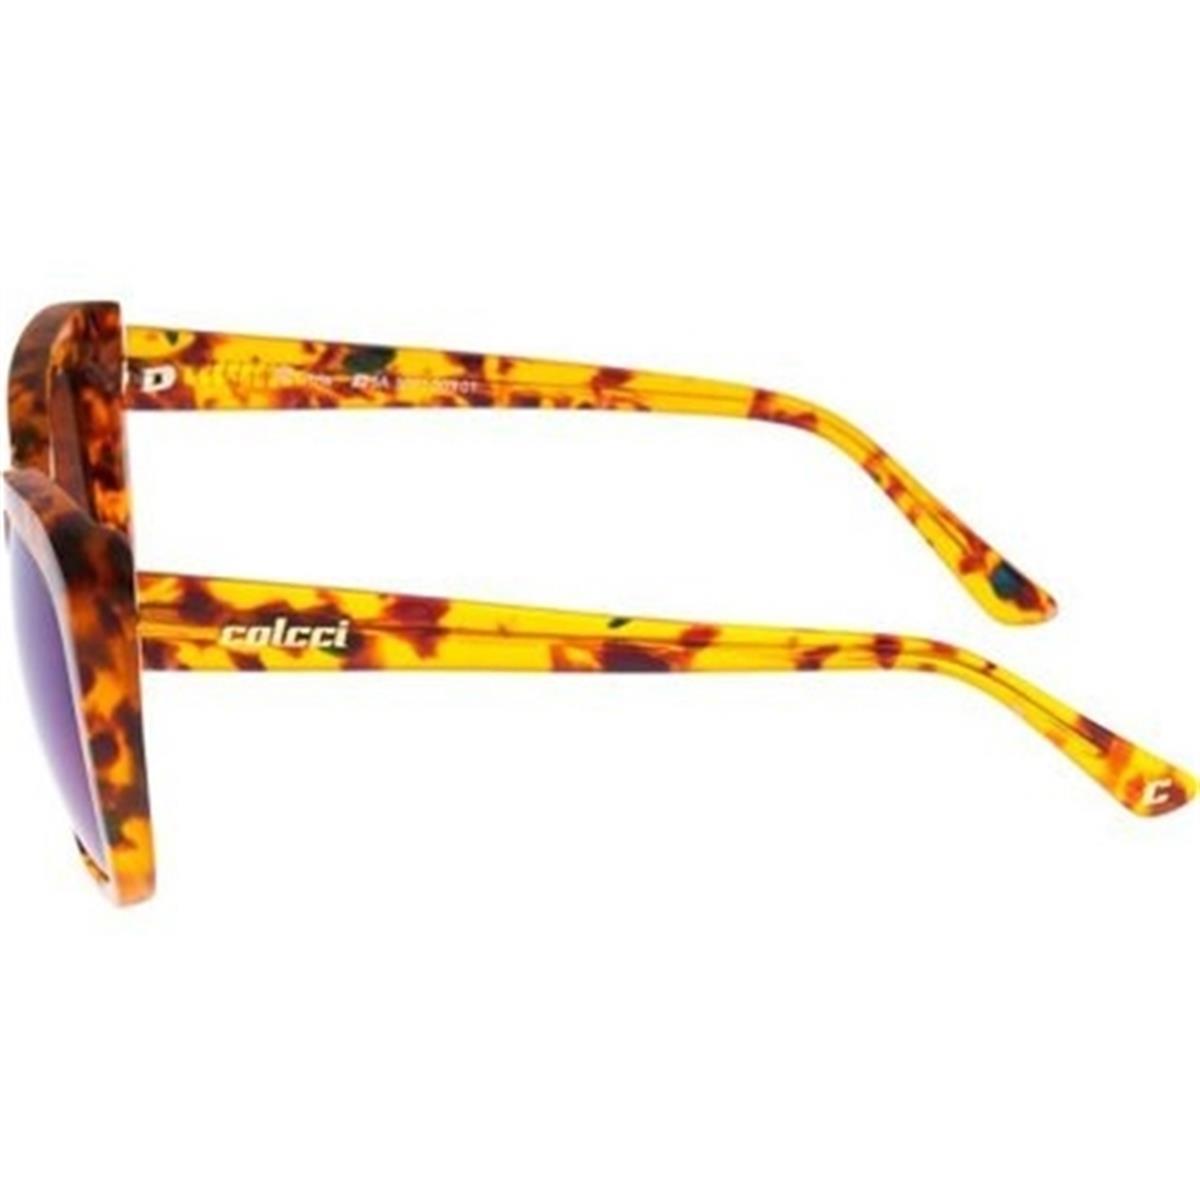 fd59a8725b2f3 4362026 oculos-de-sol-feminino-demi-claro-lente-azul-5001-colcci Z2.jpg